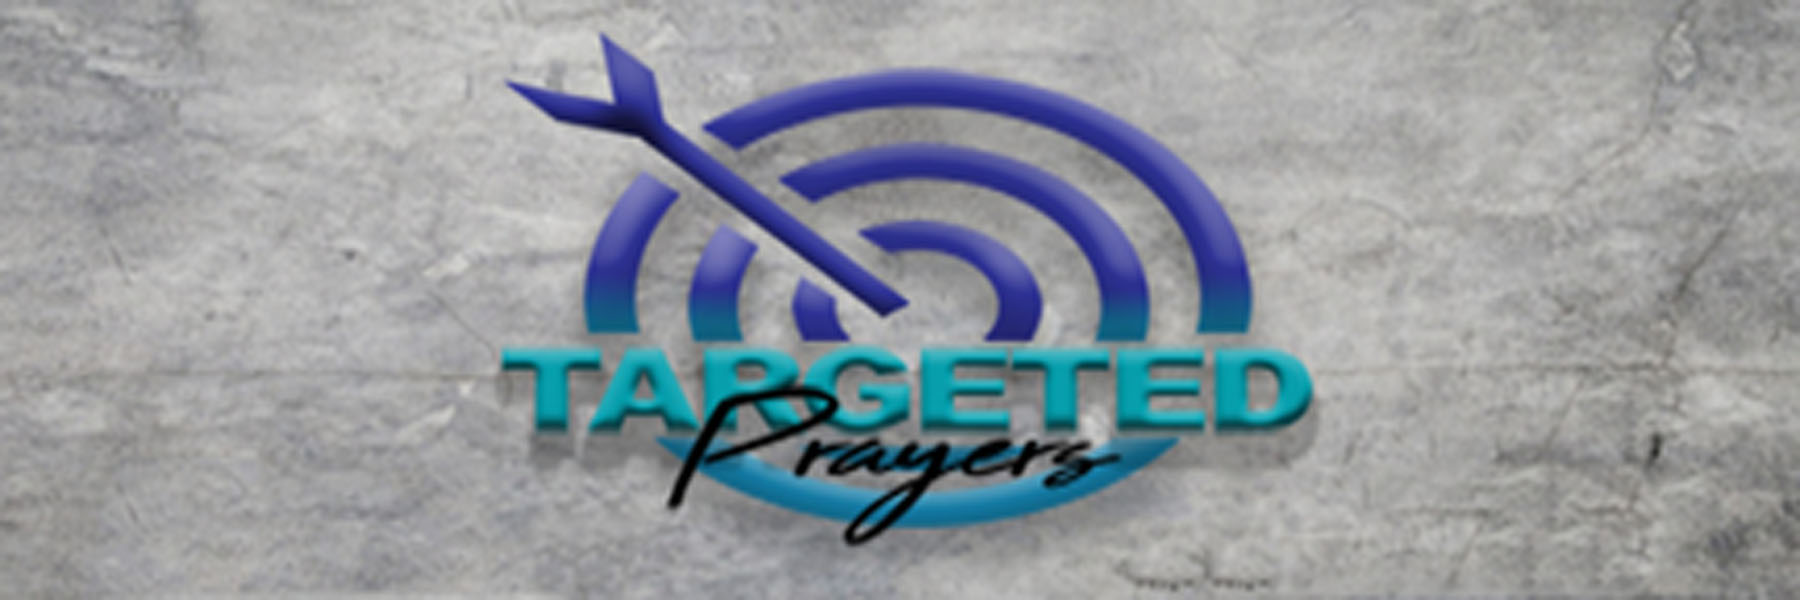 tageted-prayers.jpg